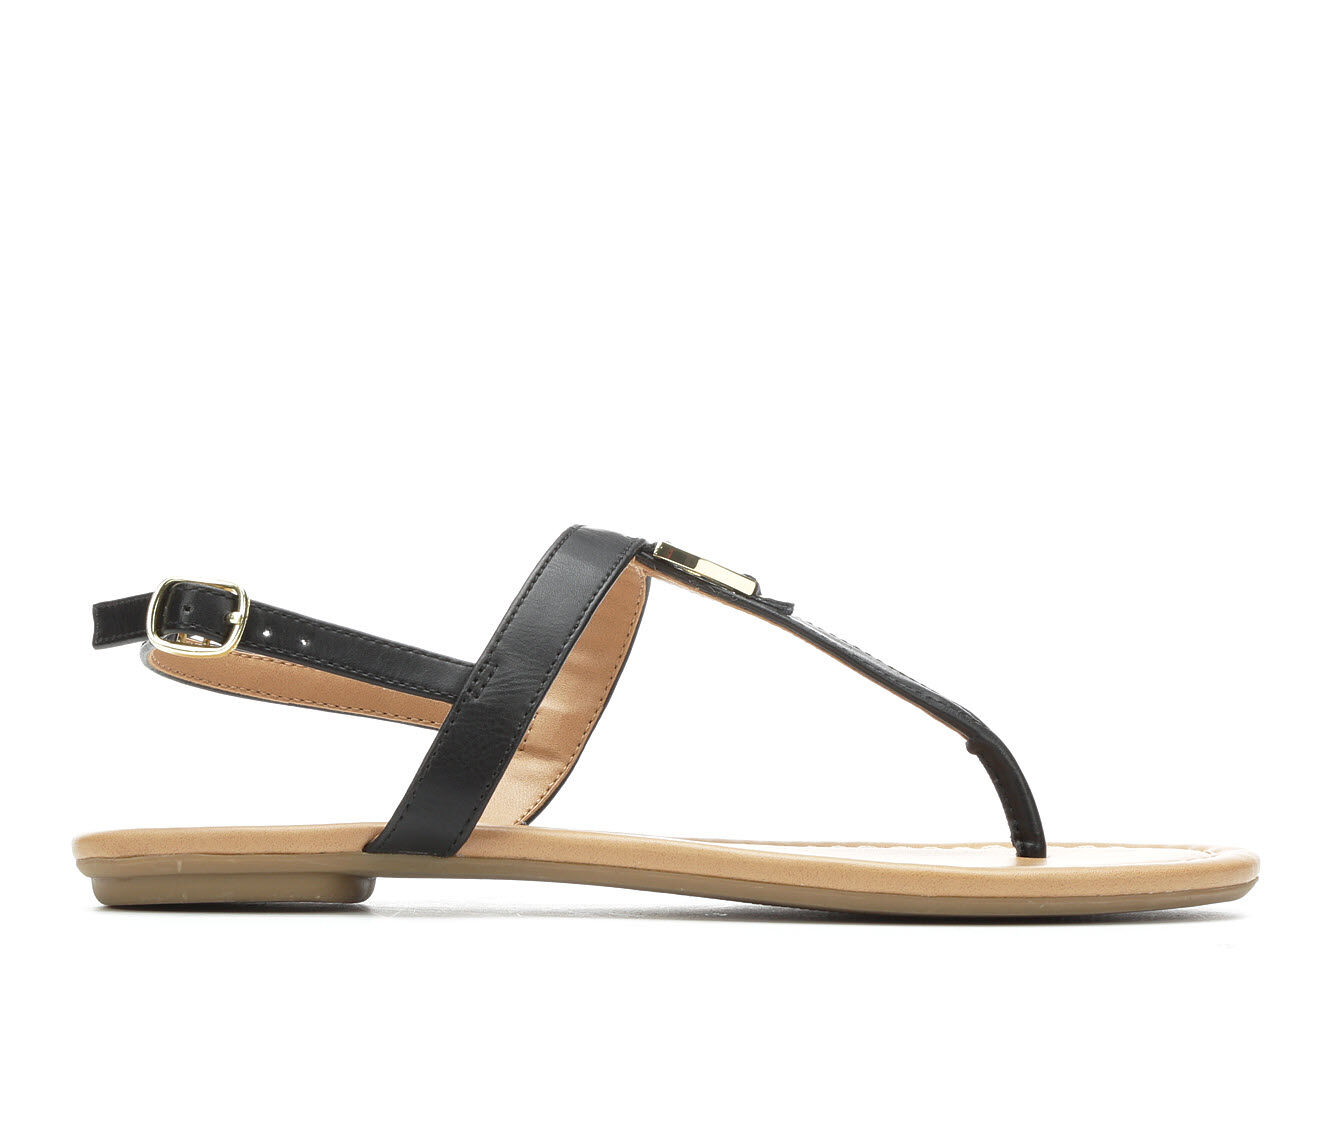 Women's Solanz Gallant Sandals Black Dory PU